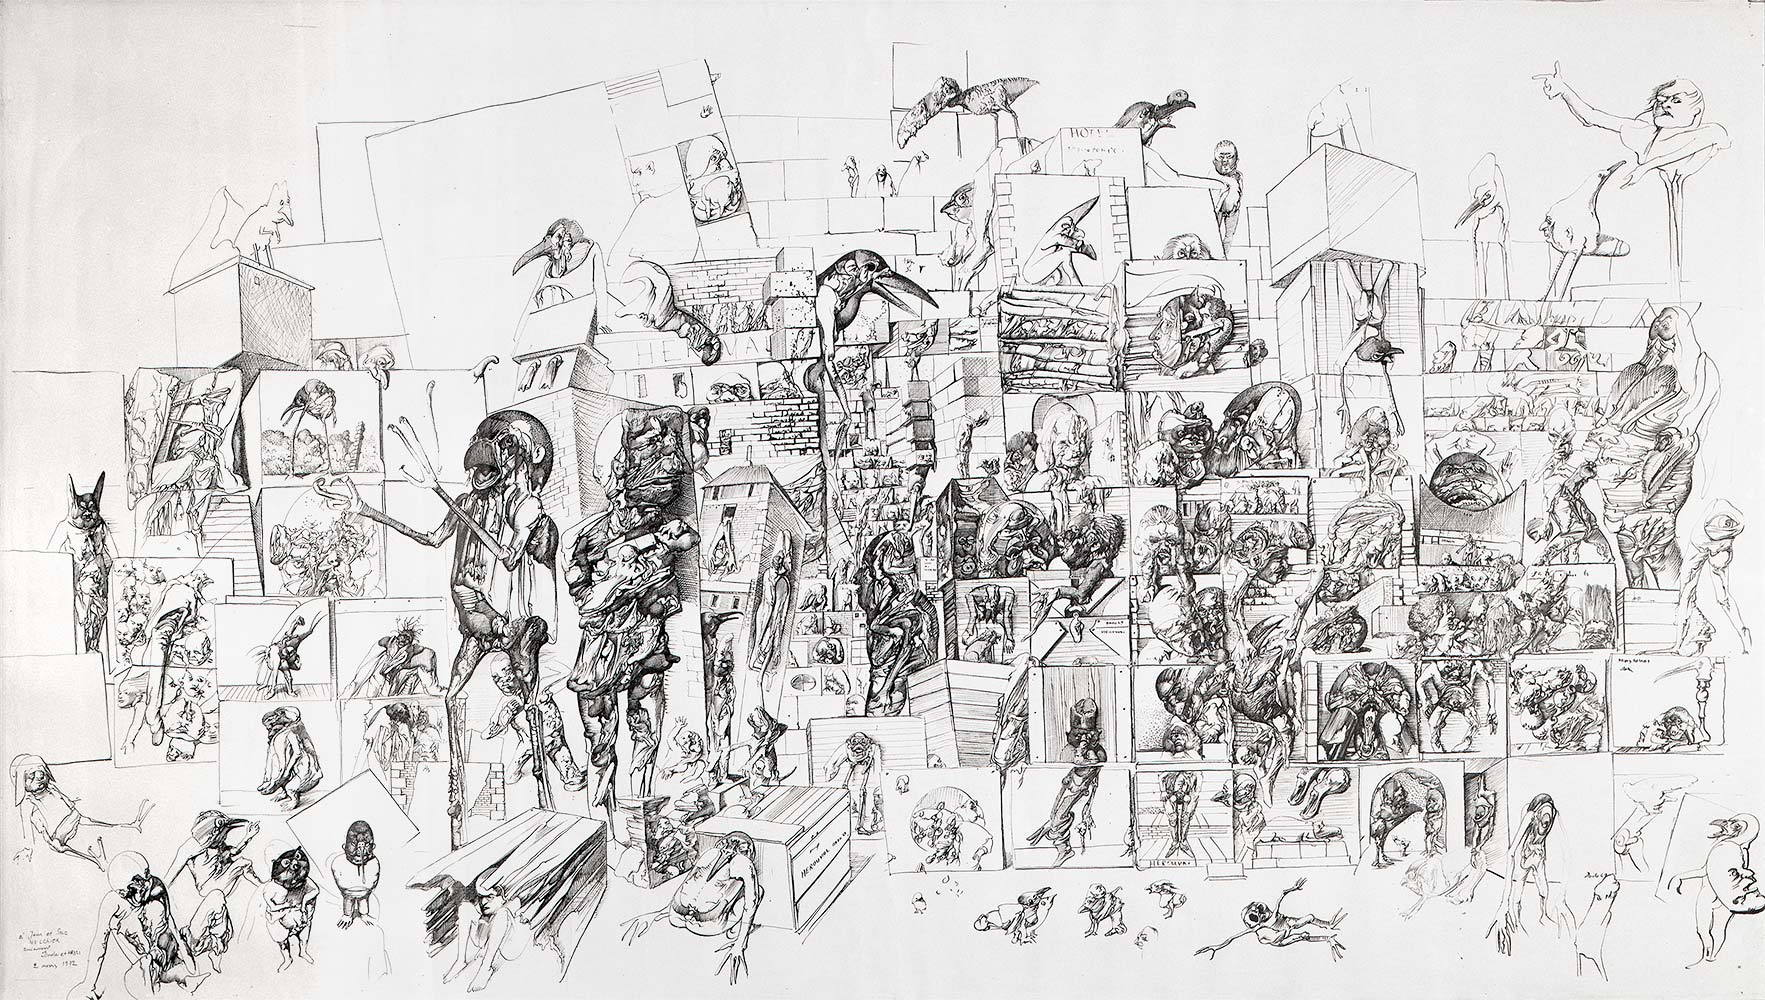 Transport of Works of Art, 1969